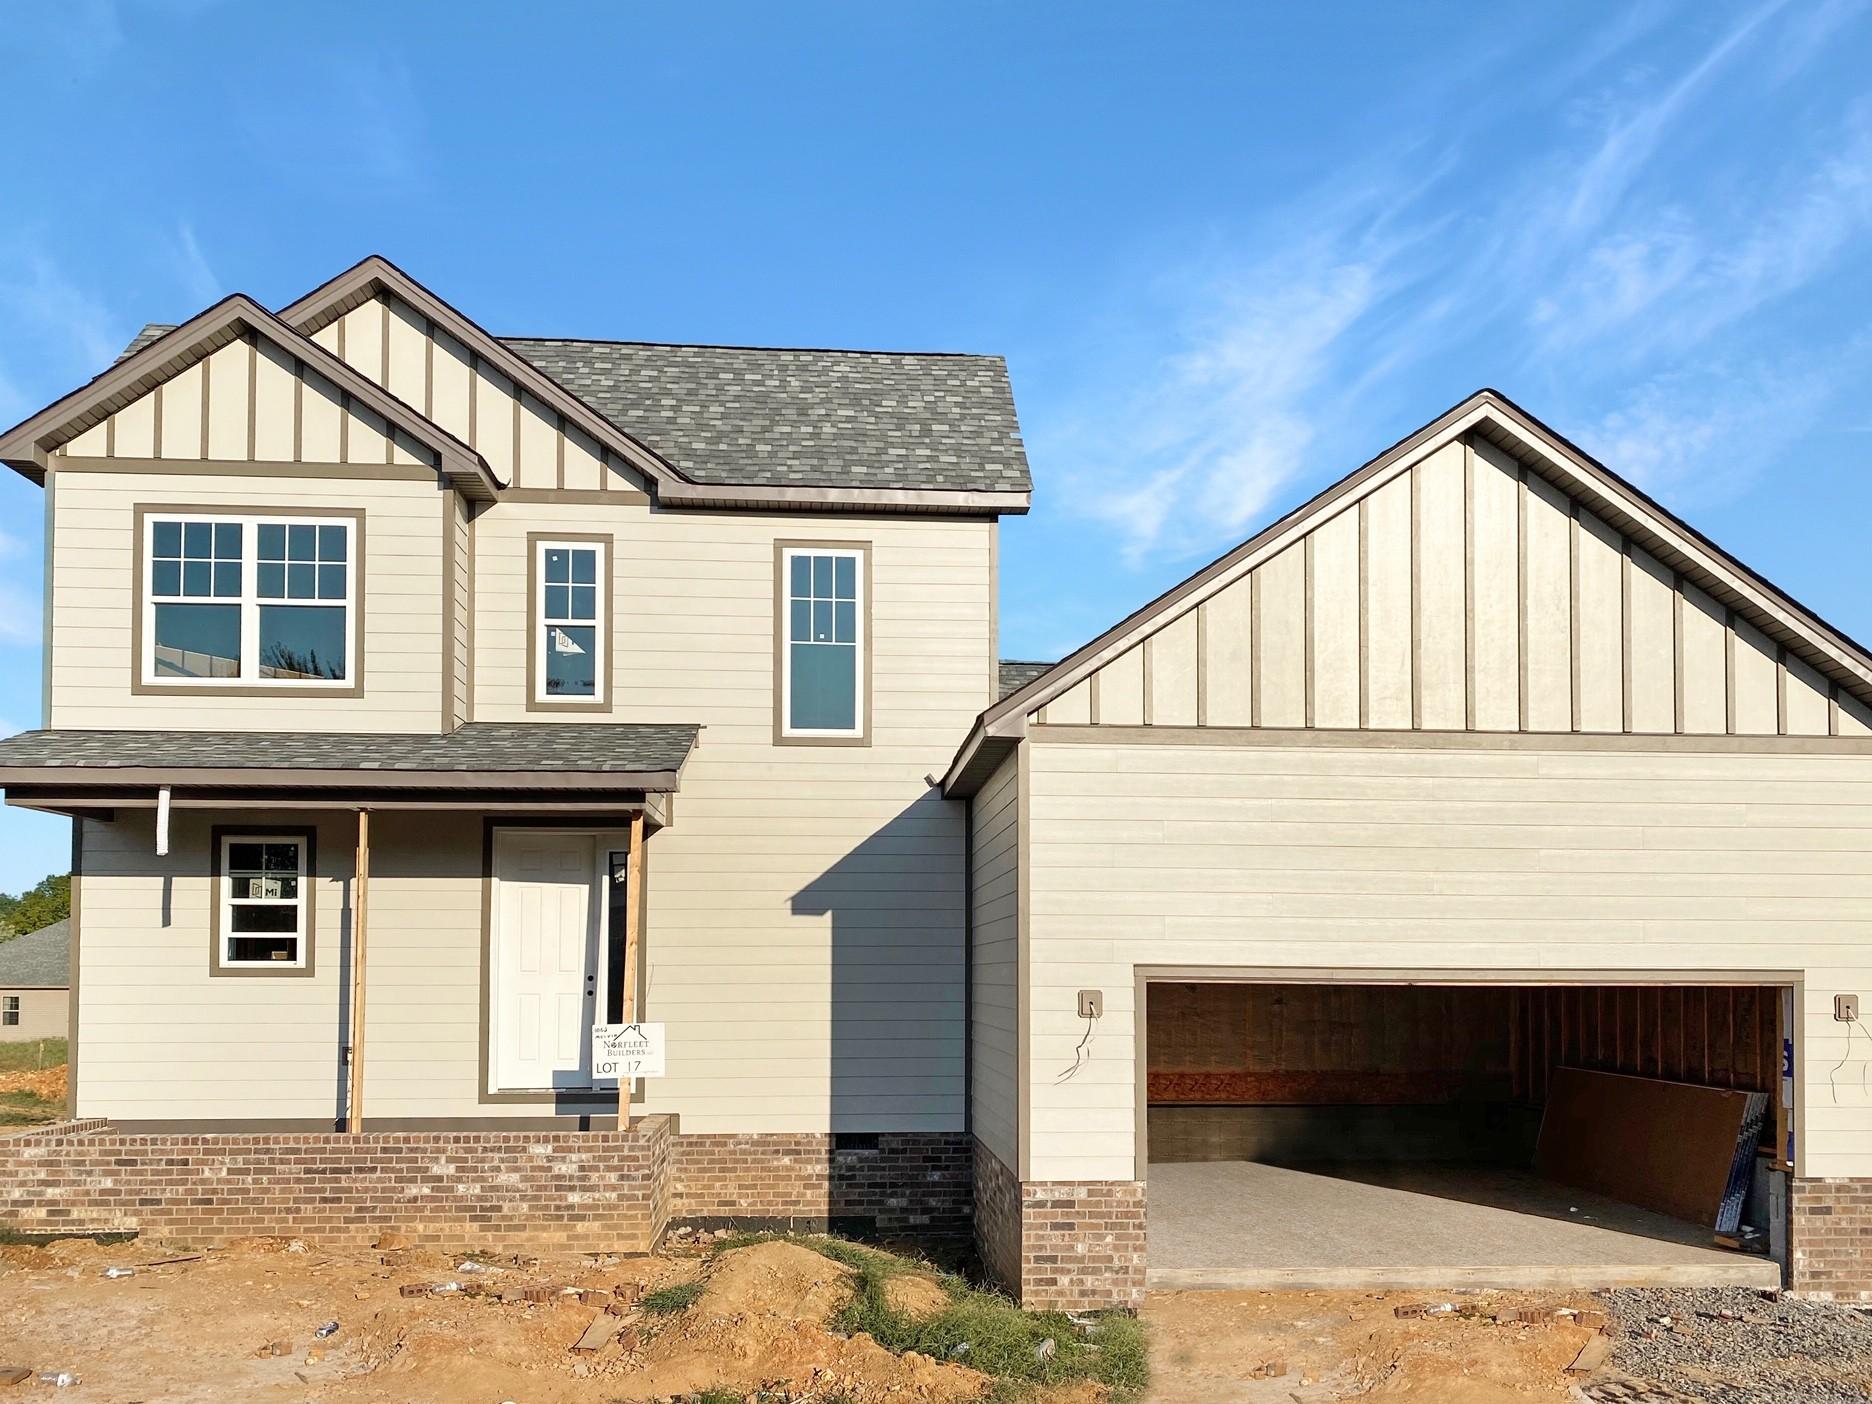 1062 Melvin Dr Property Photo - Cross Plains, TN real estate listing